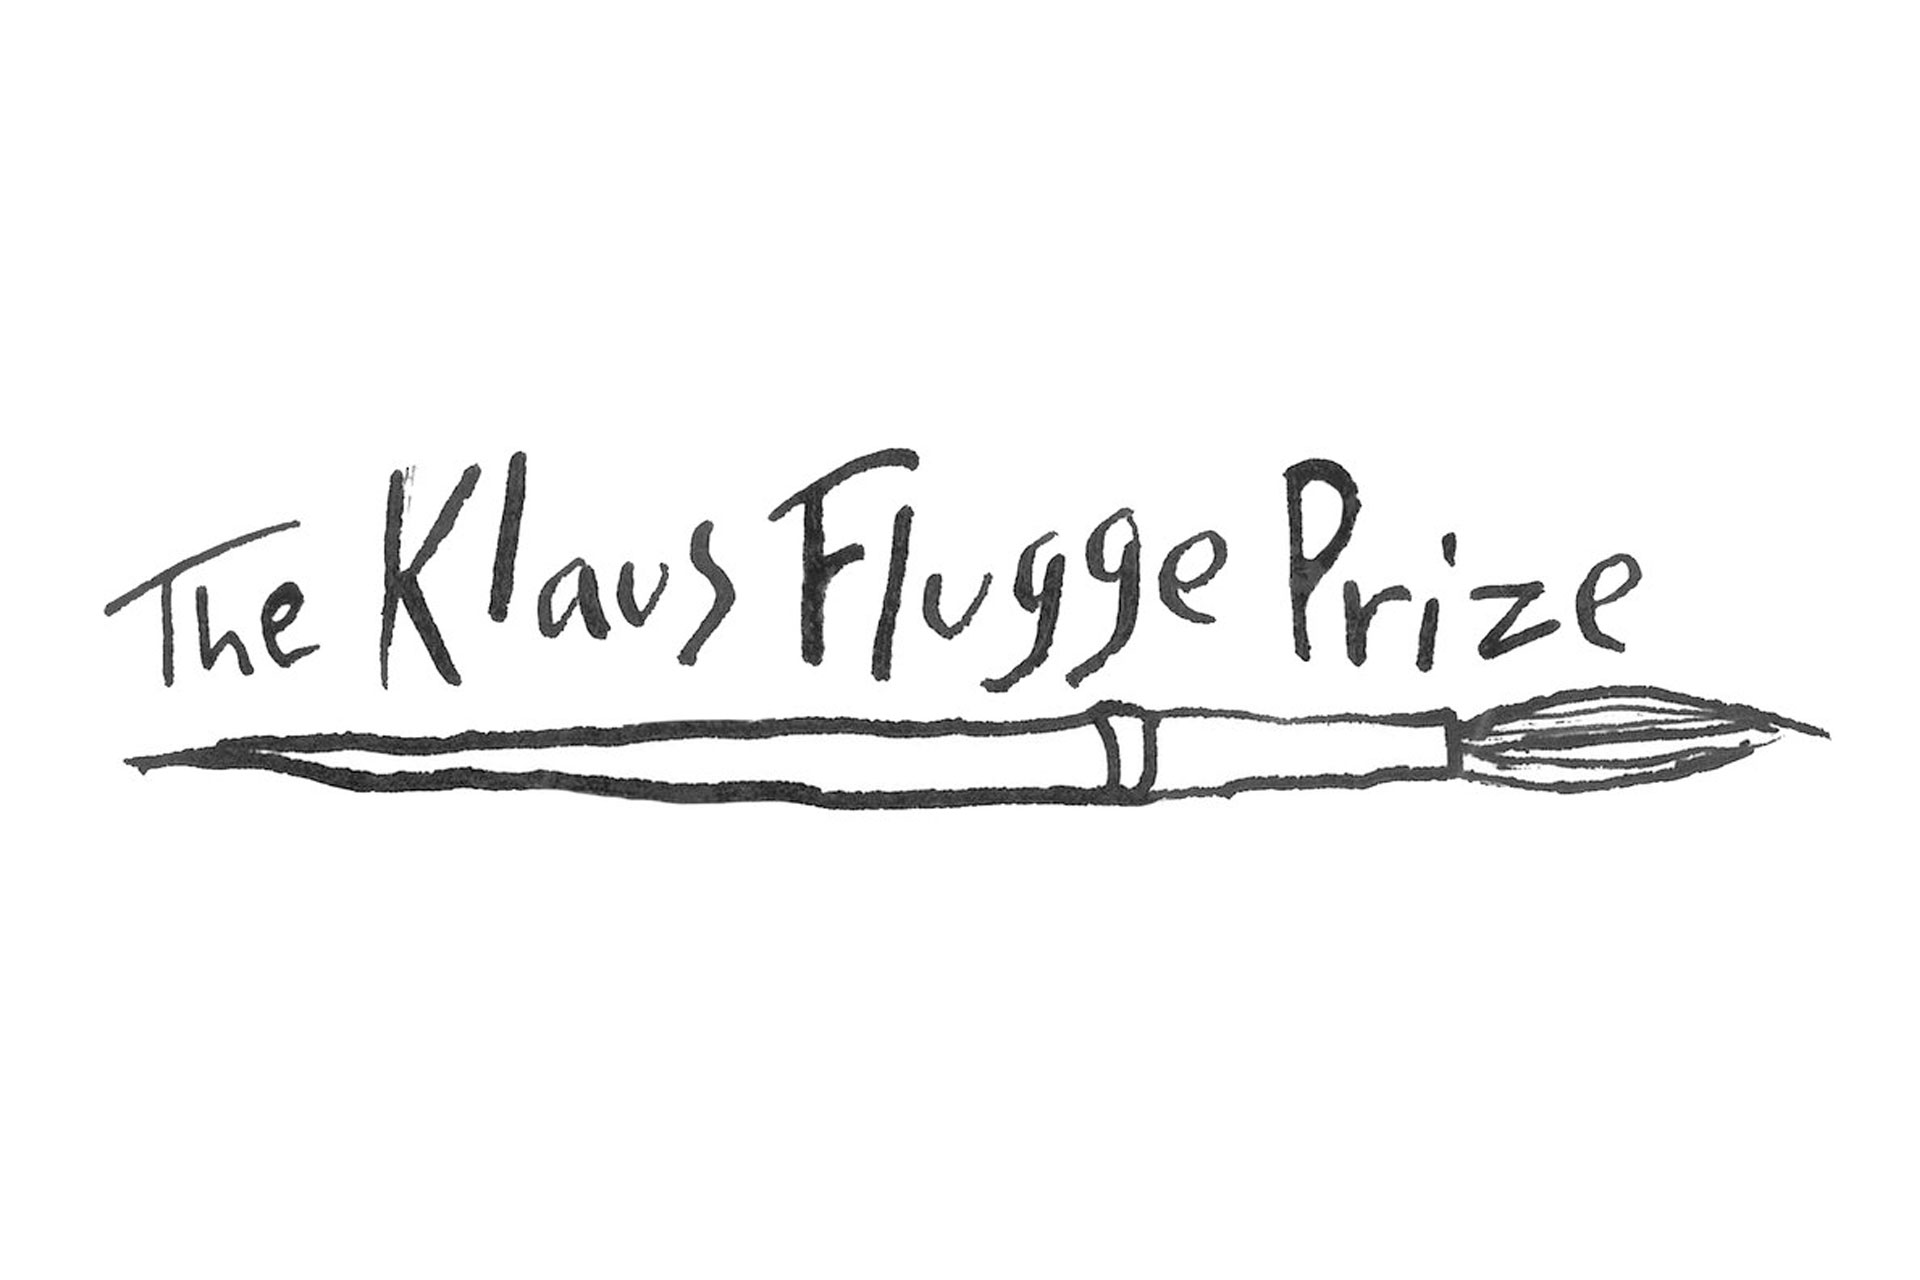 Klaus Flugge Prize 2019